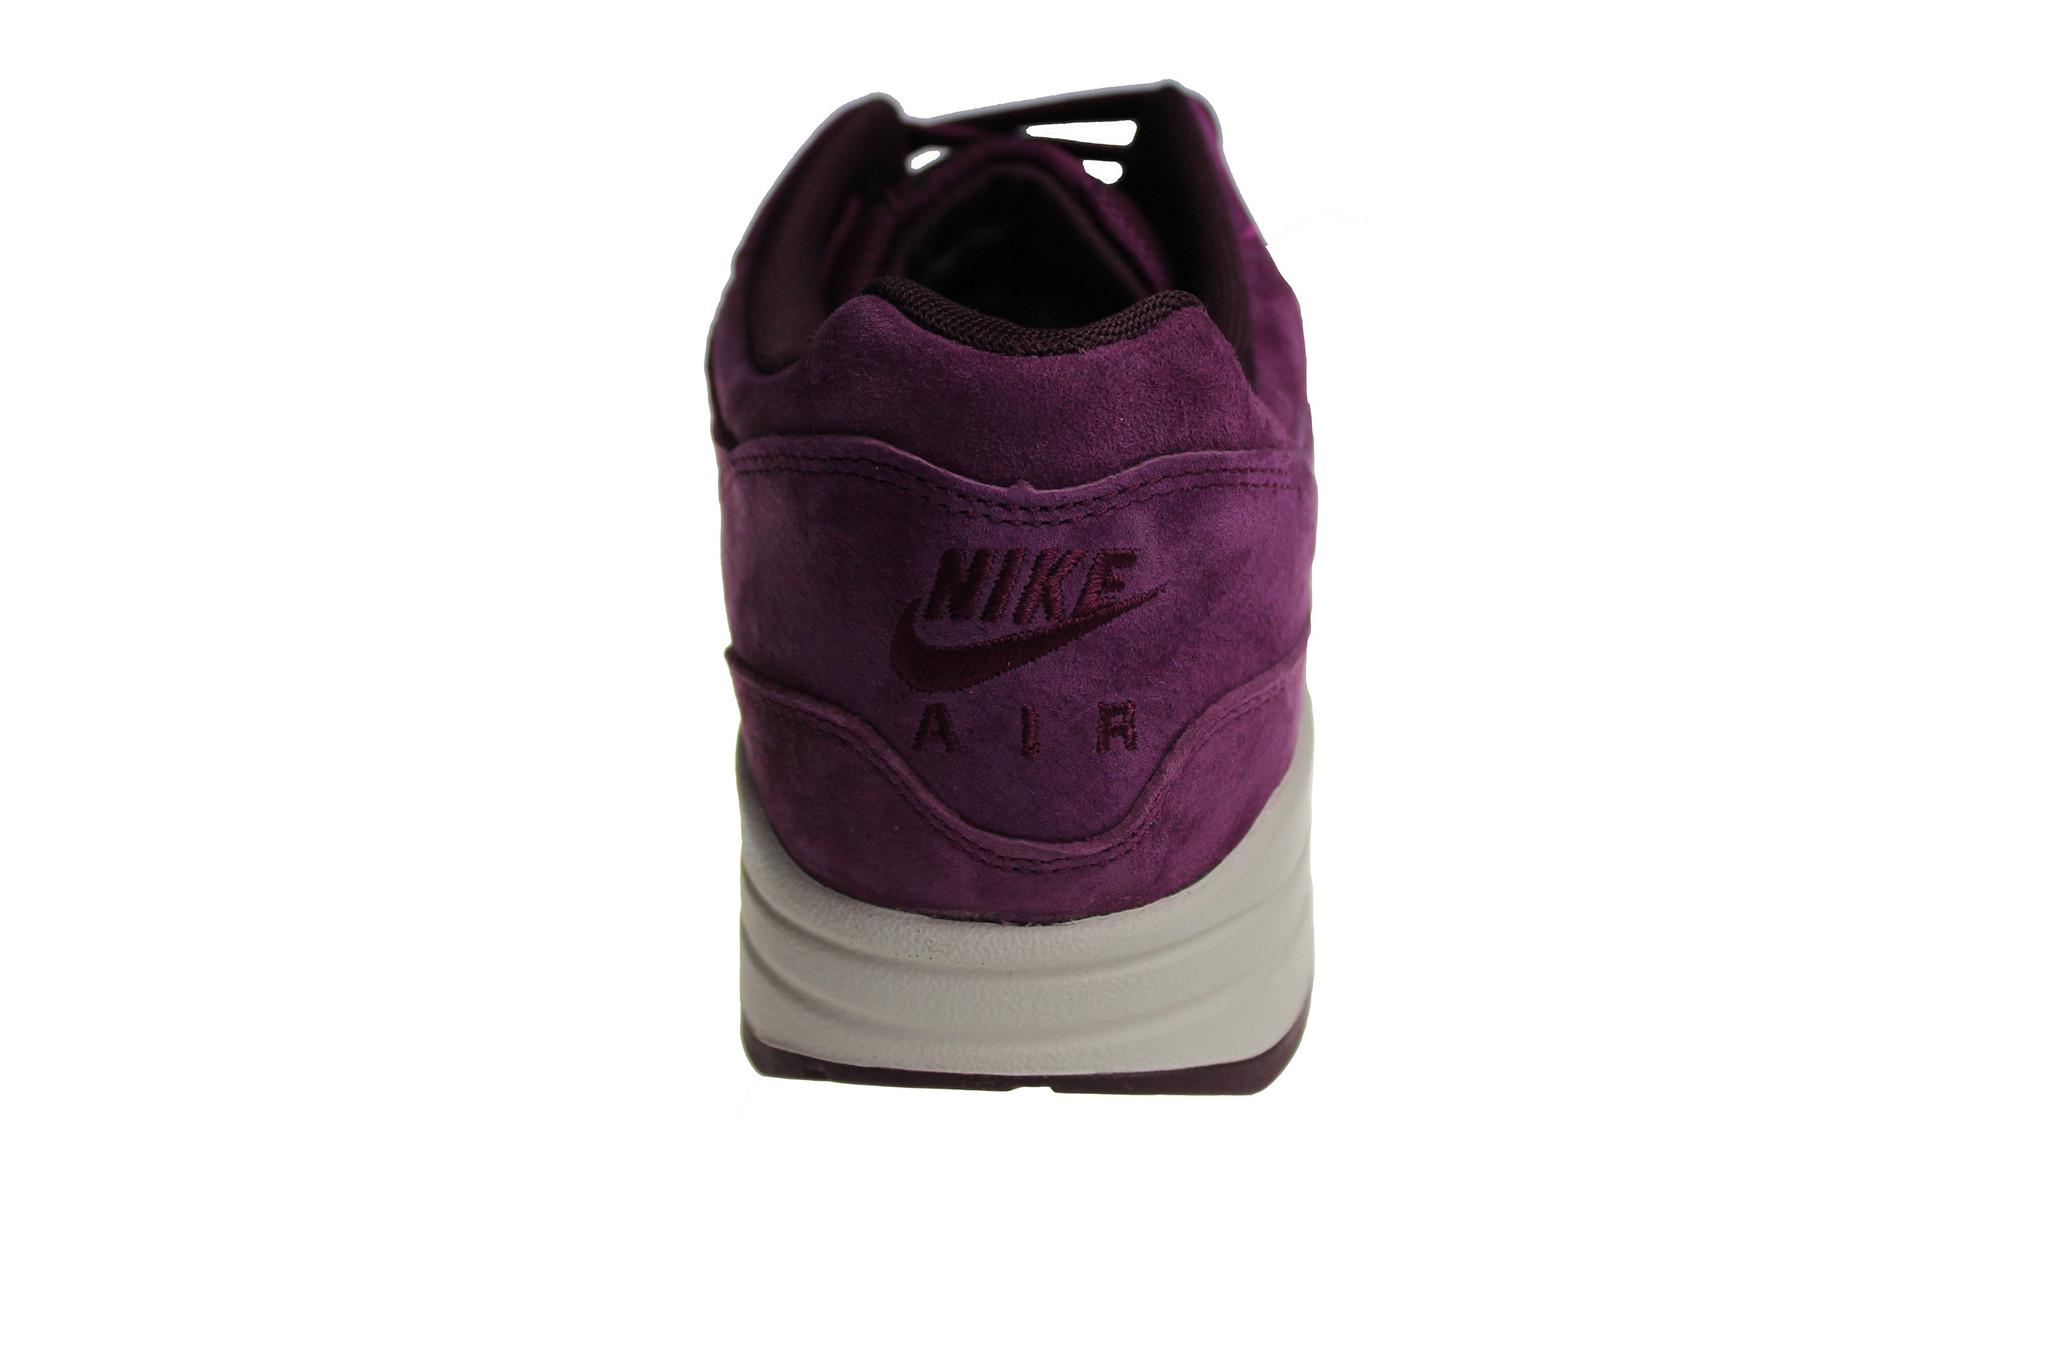 20eebcb404 Nike Air Max 1 Premium (Bordeaux/Off-White) 875844 602 Men's Sneakers